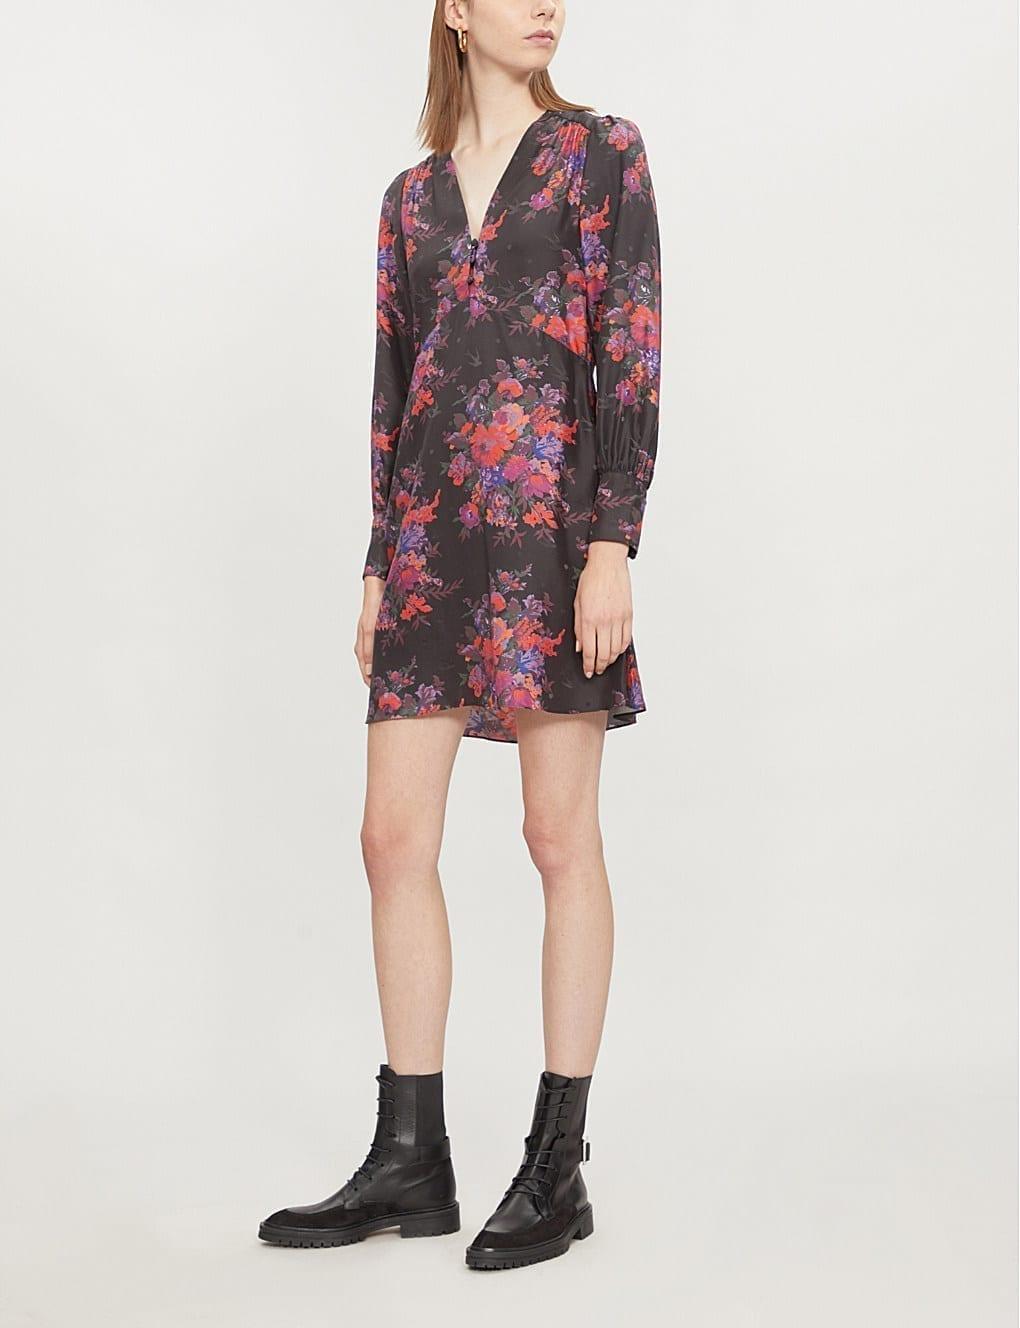 aeda3c965258a MCQ ALEXANDER MCQUEEN Floral Print Silk Satin Darkest Black Dress ...